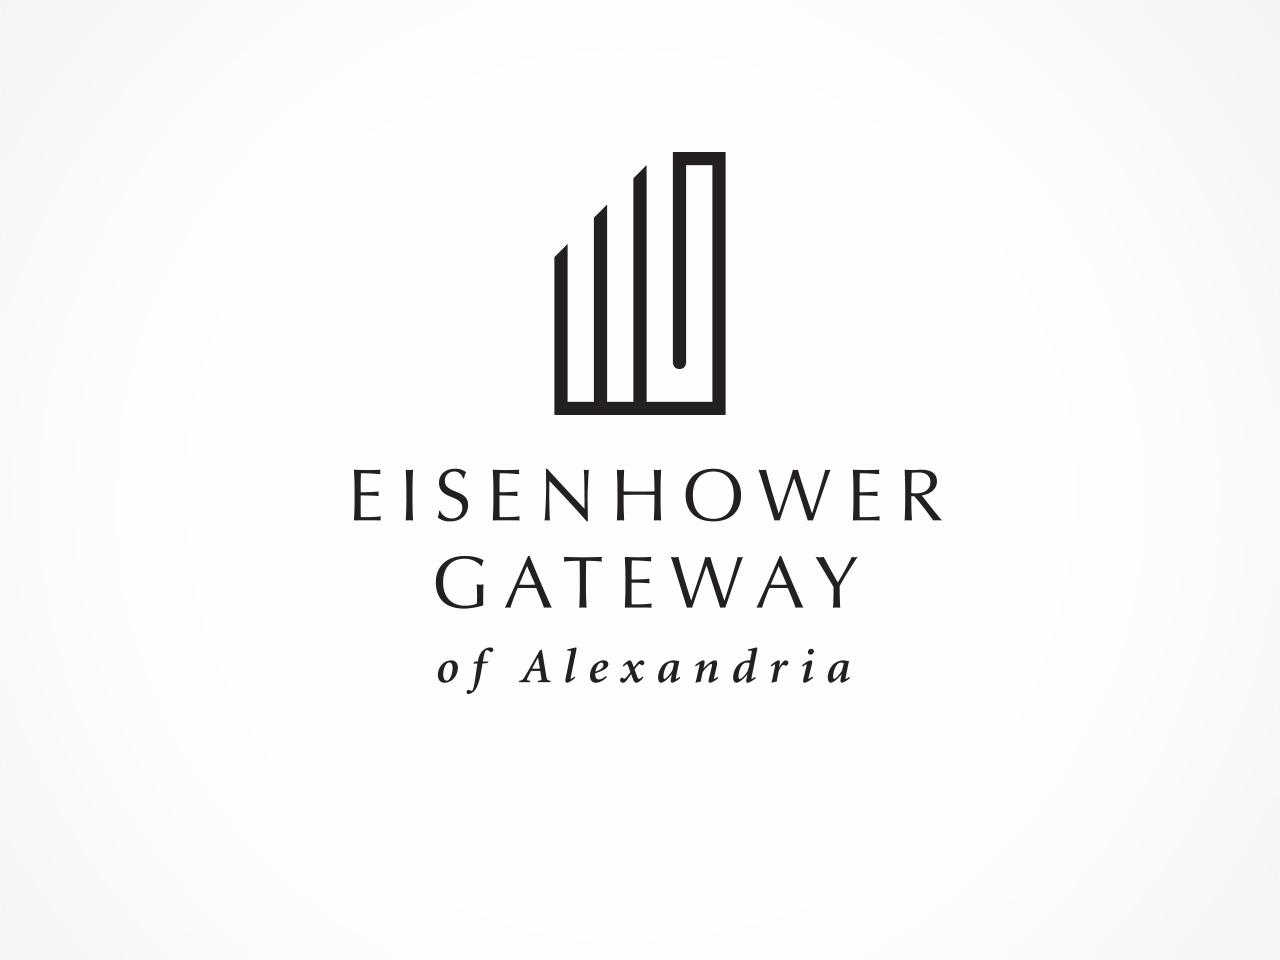 Eisenhower Gateway logo